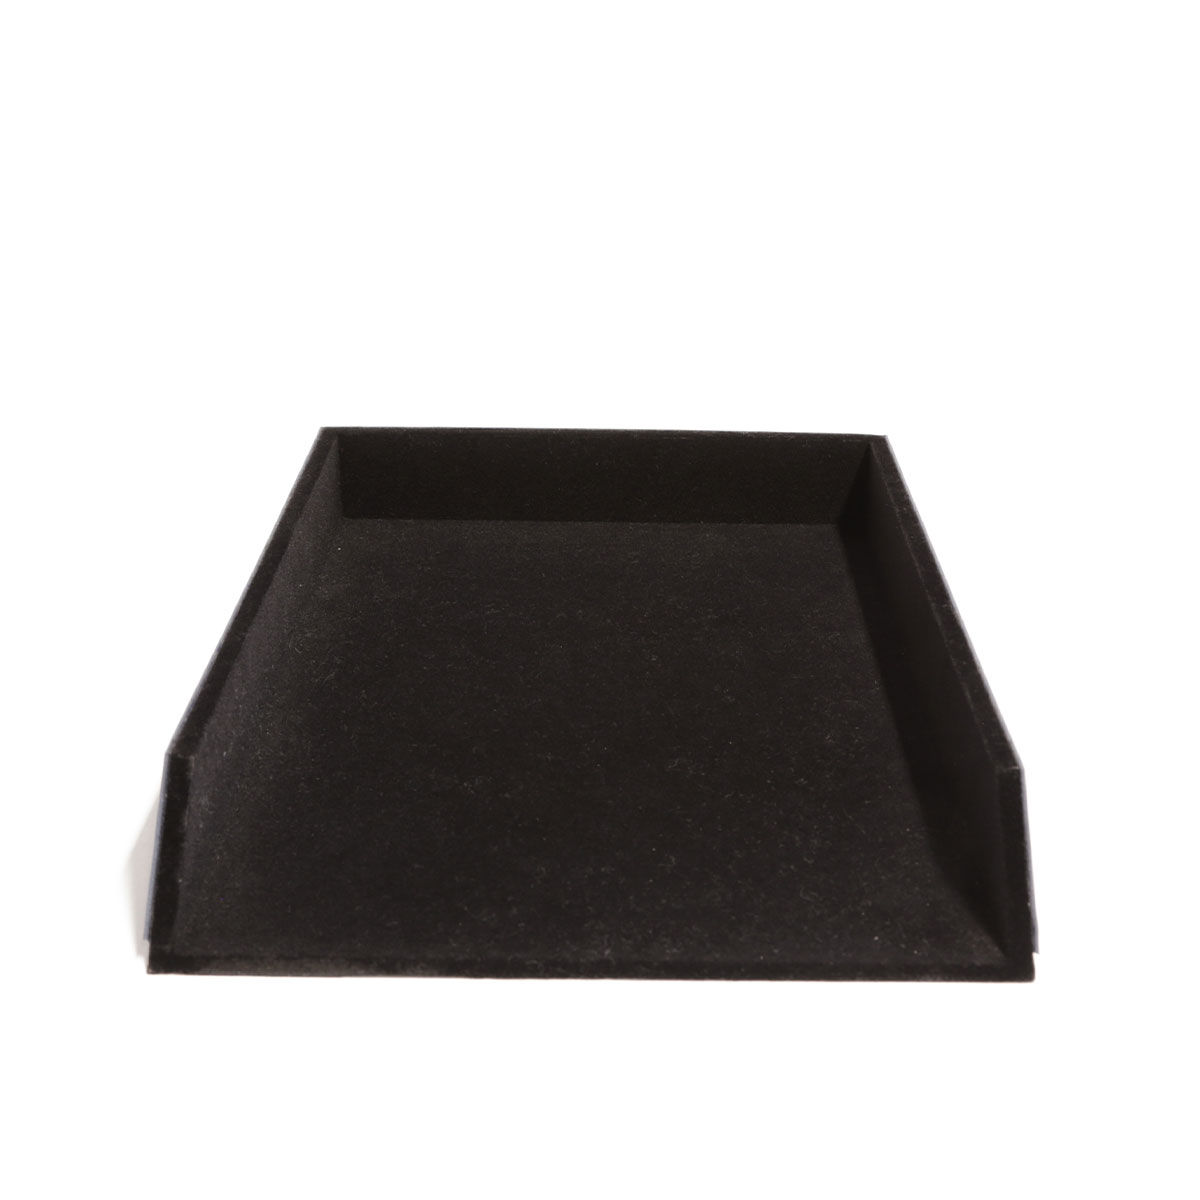 Caixa porta papel A4 (Savana Cinza)